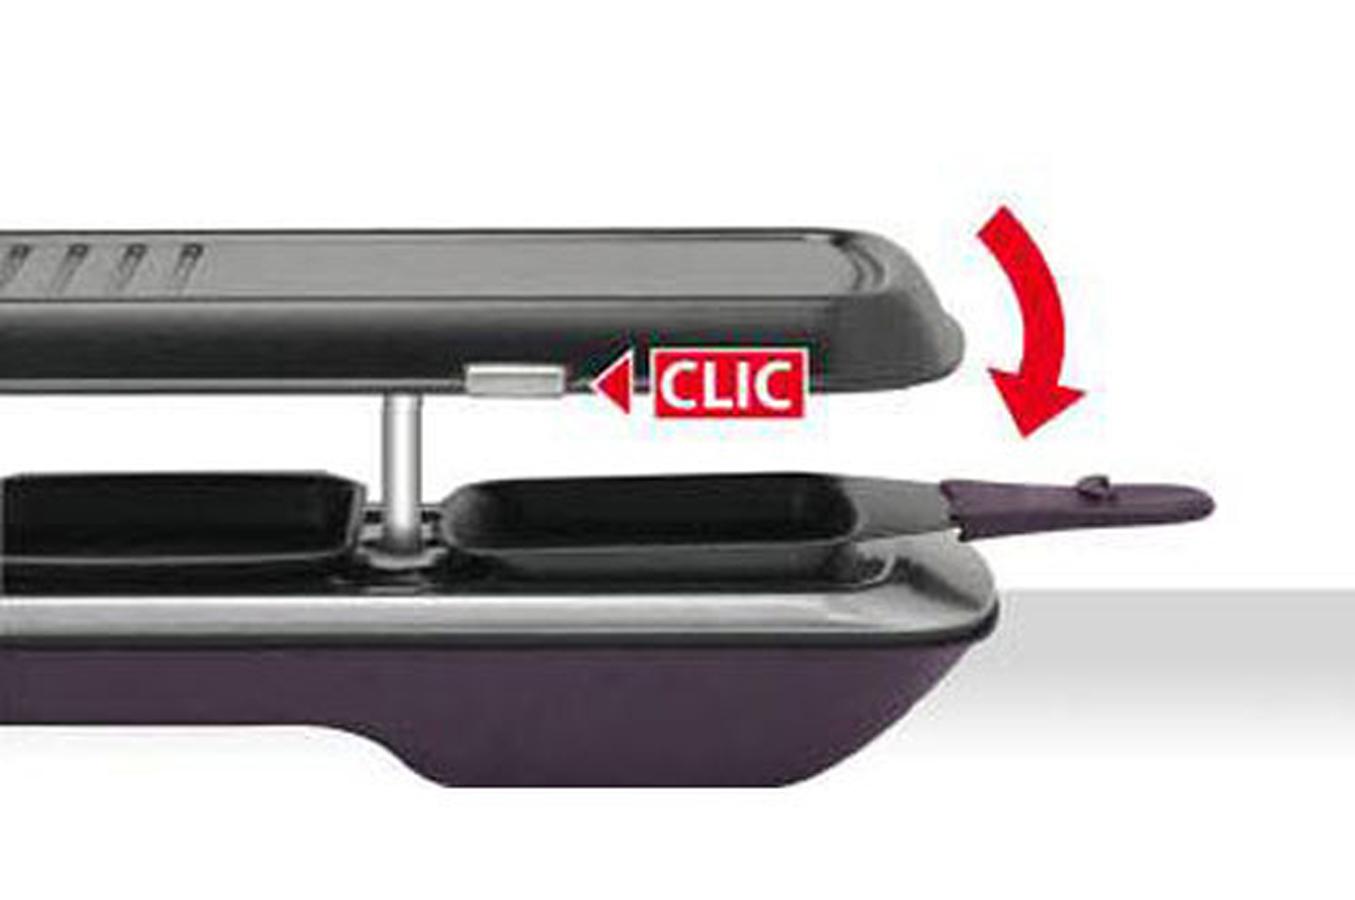 Raclette tefal re520012 simply line simply line 3339106 darty - Raclette tefal simply line ...